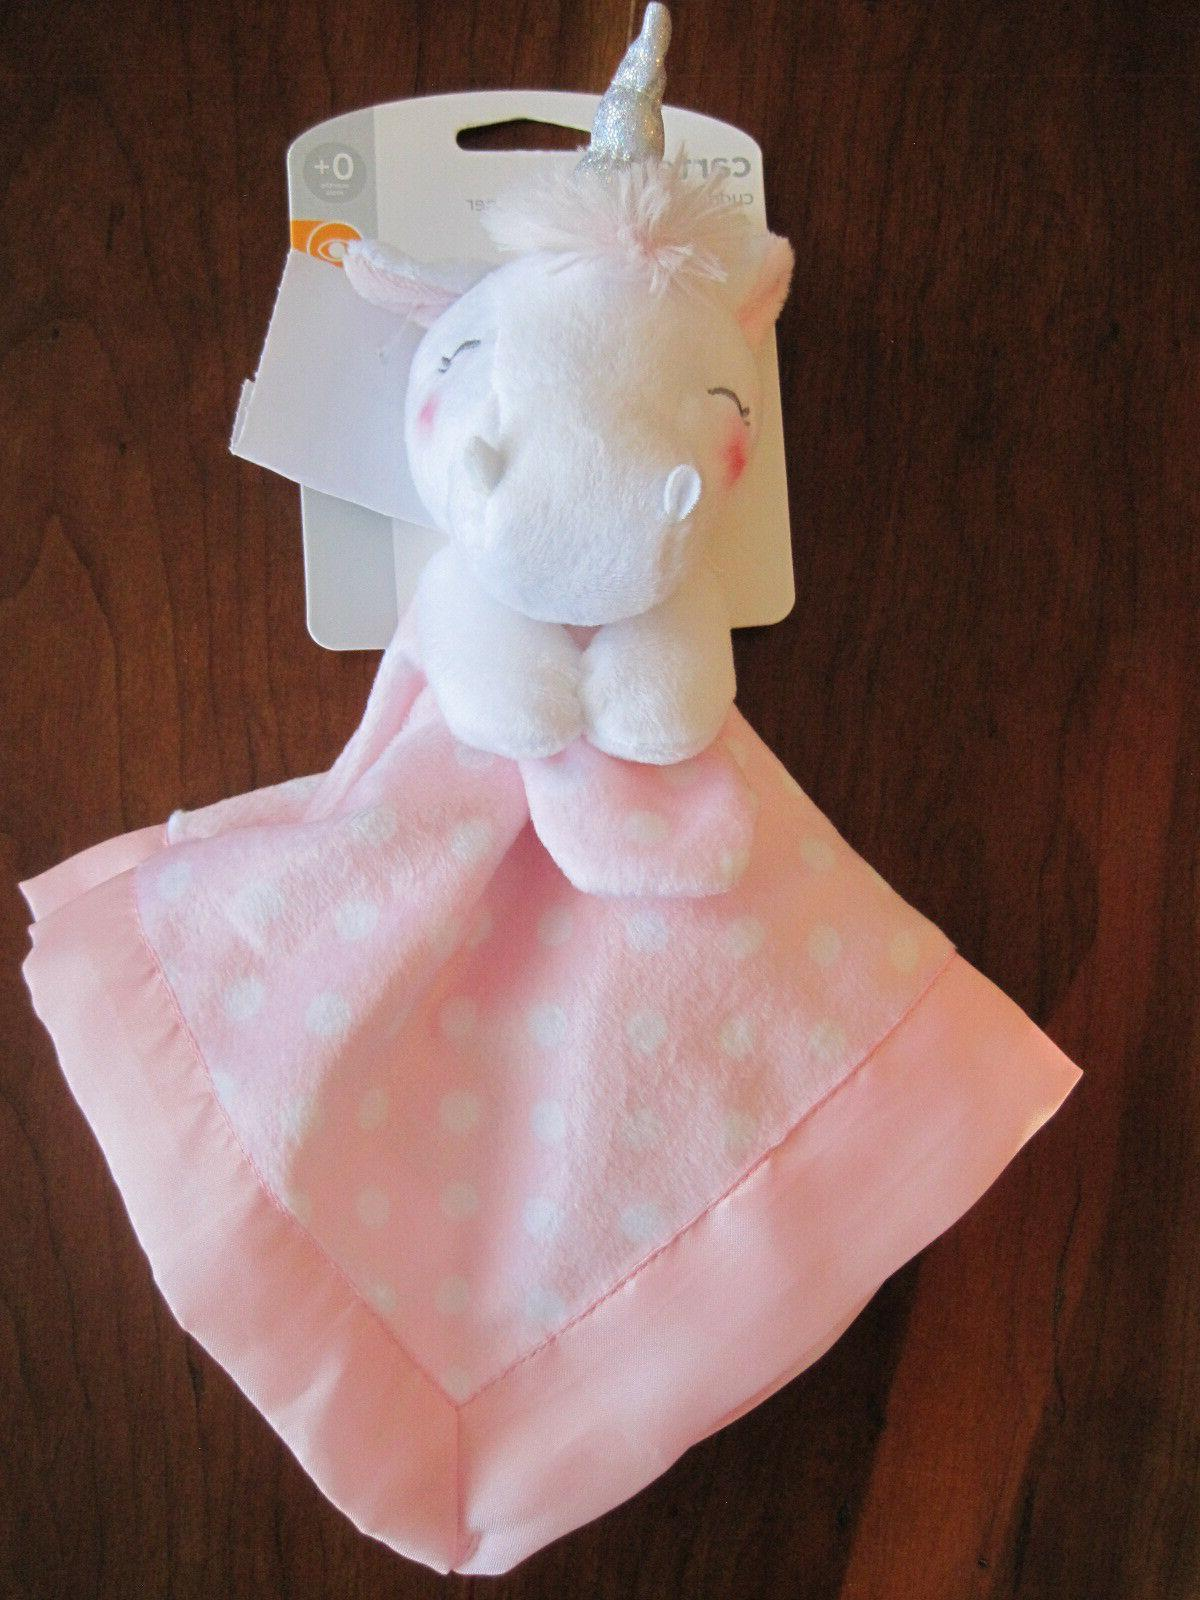 NWT CARTER'S Pink White Unicorn Plush Satin Lovey Security B